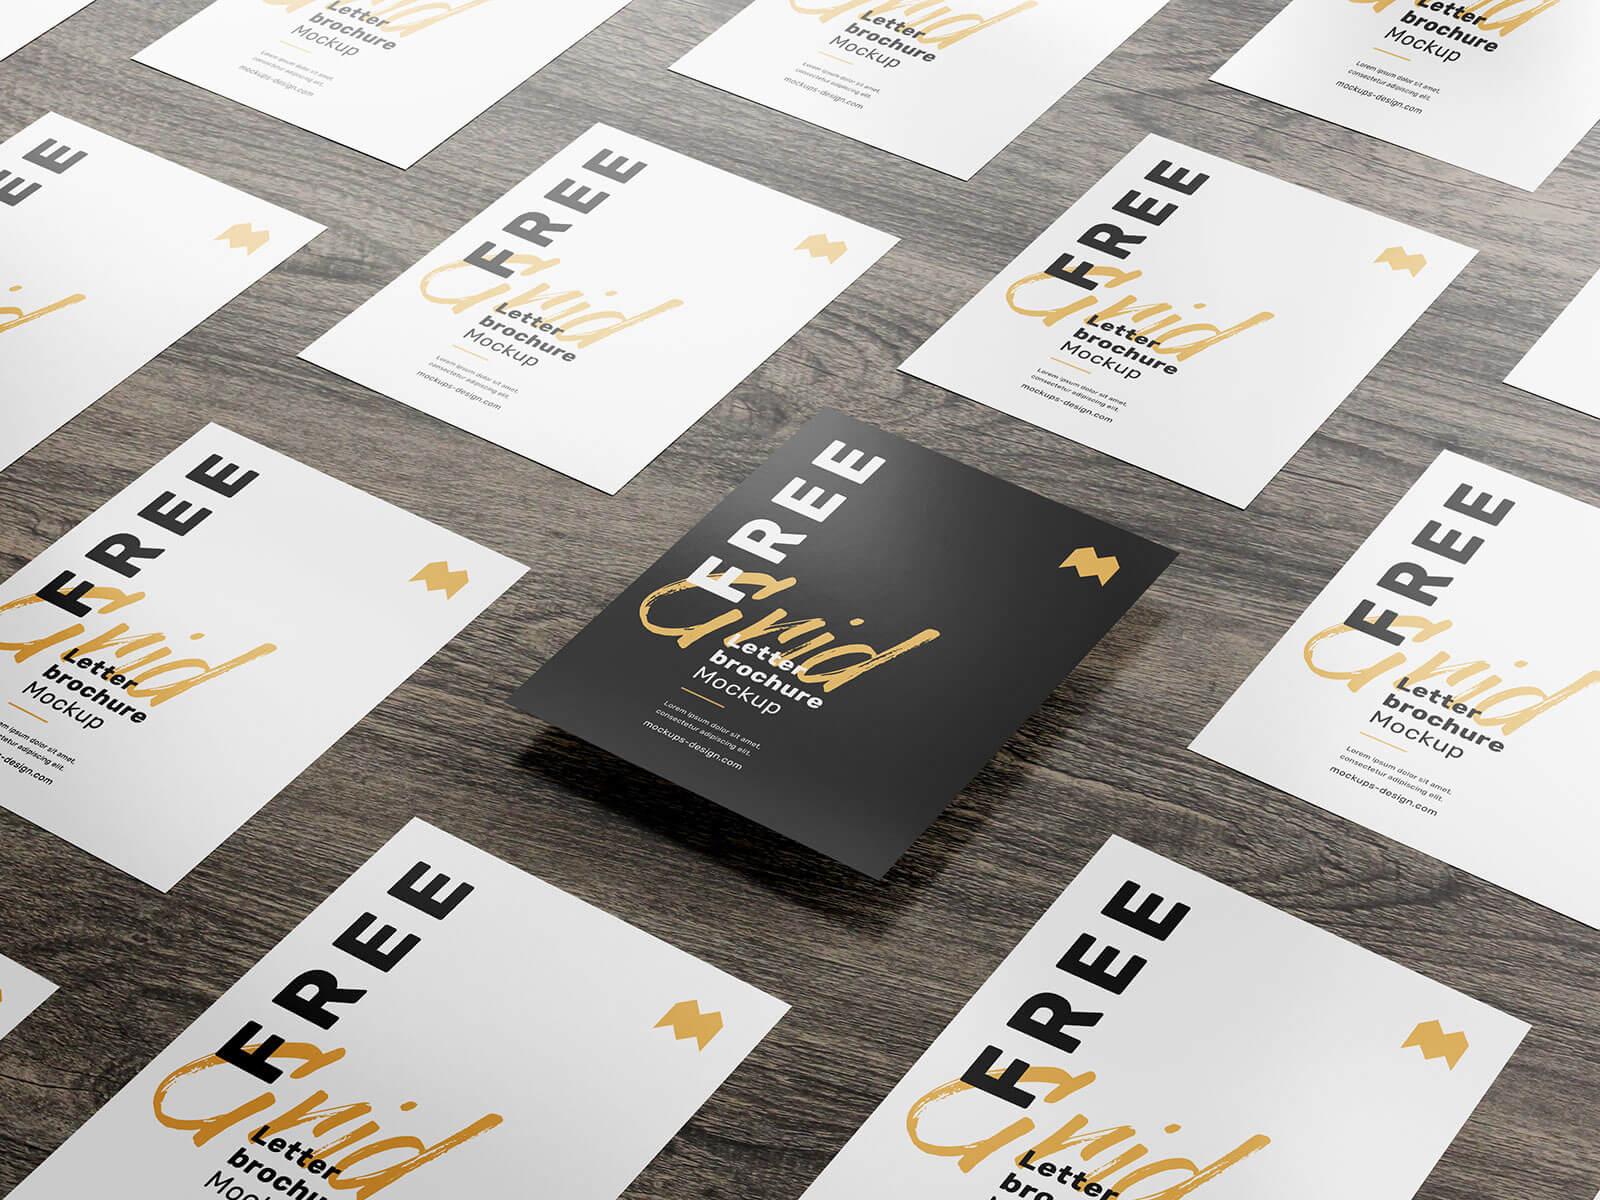 Free_Double Sided US_Letter_Brochure_Flyer Mockup_PSD Set (2)